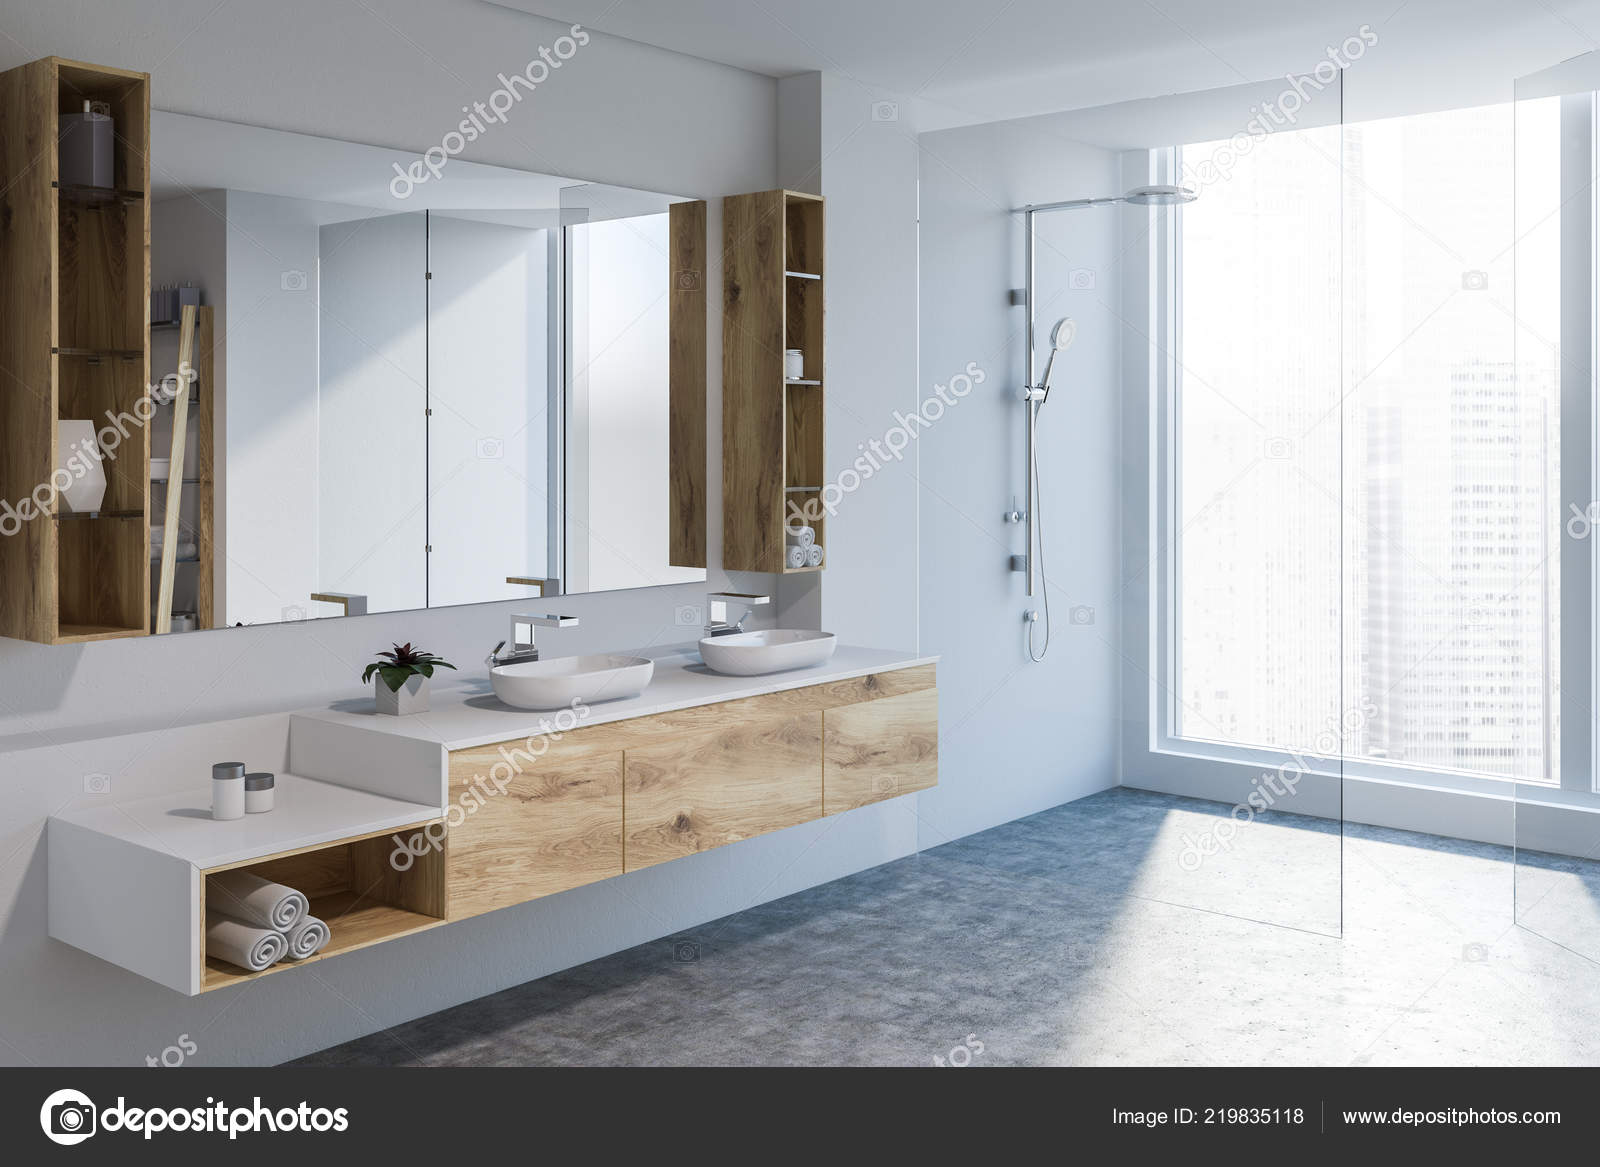 Moderne badkamer hoek met witte muren betonnen vloer dubbele